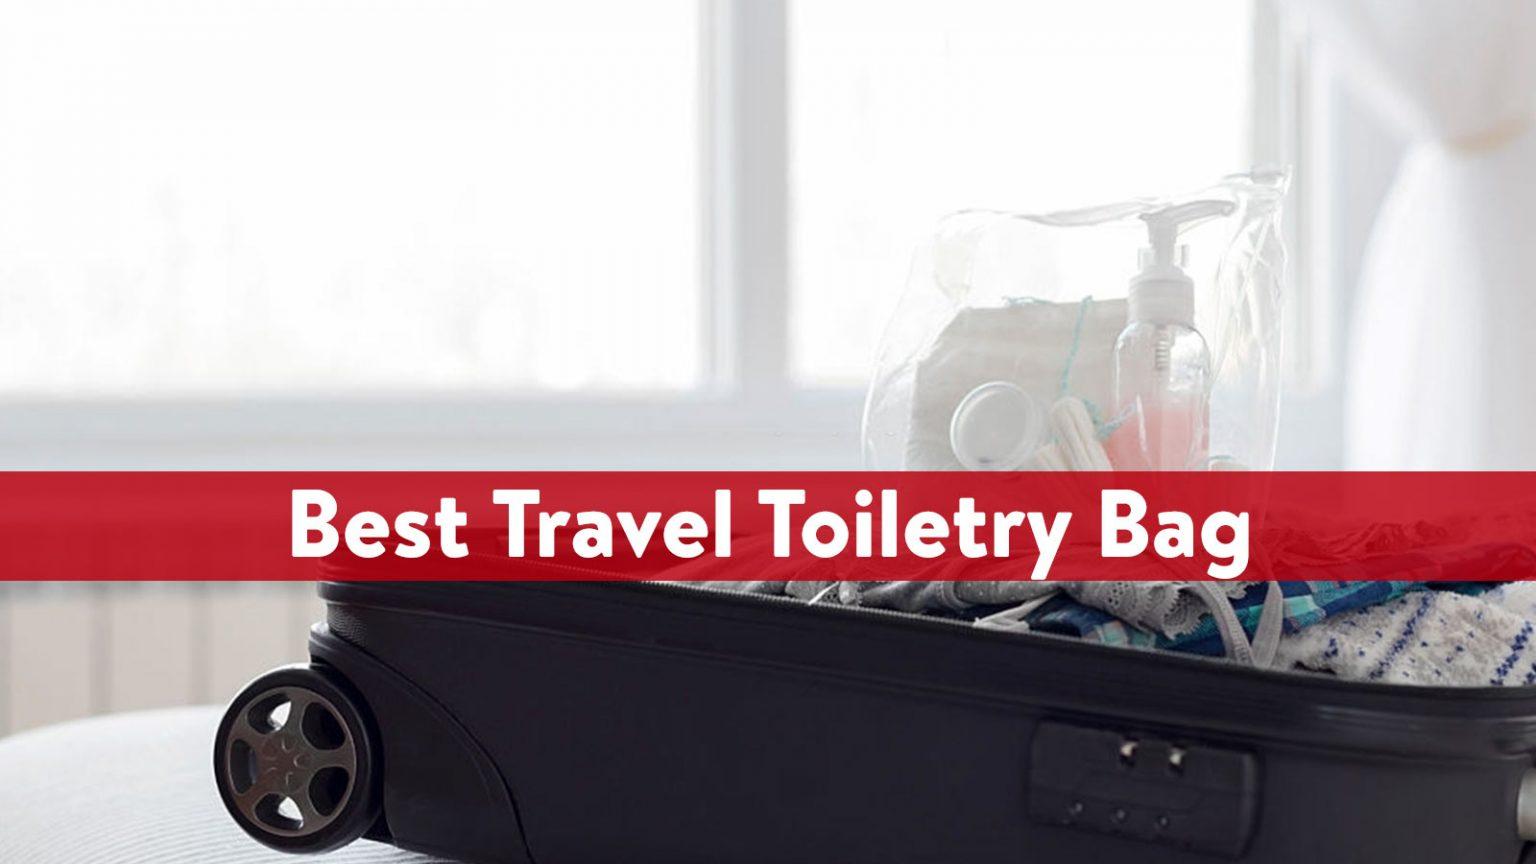 Best Travel Toiletry Bag